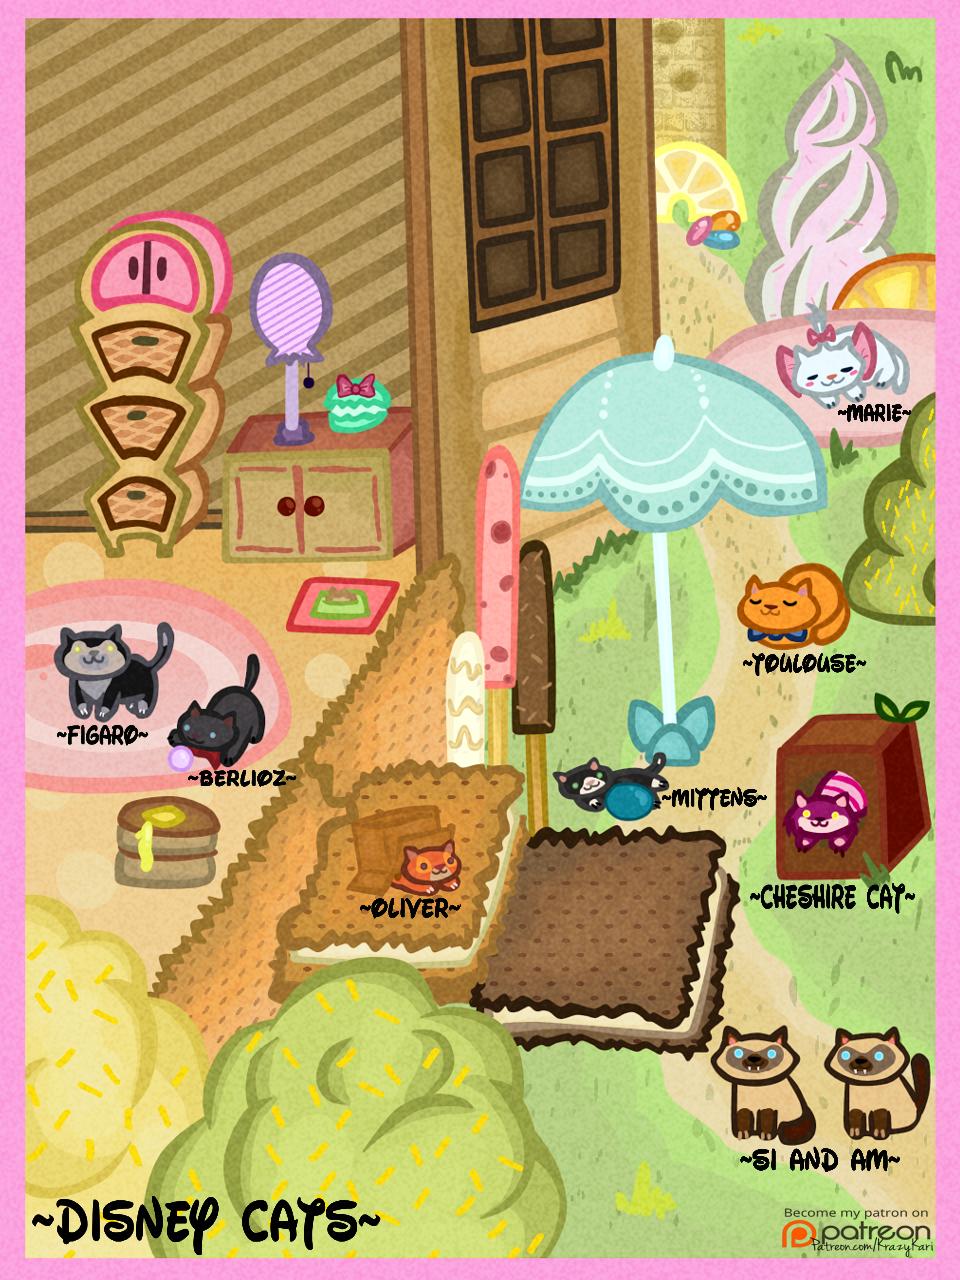 (Neko Atsume) Disney Cats